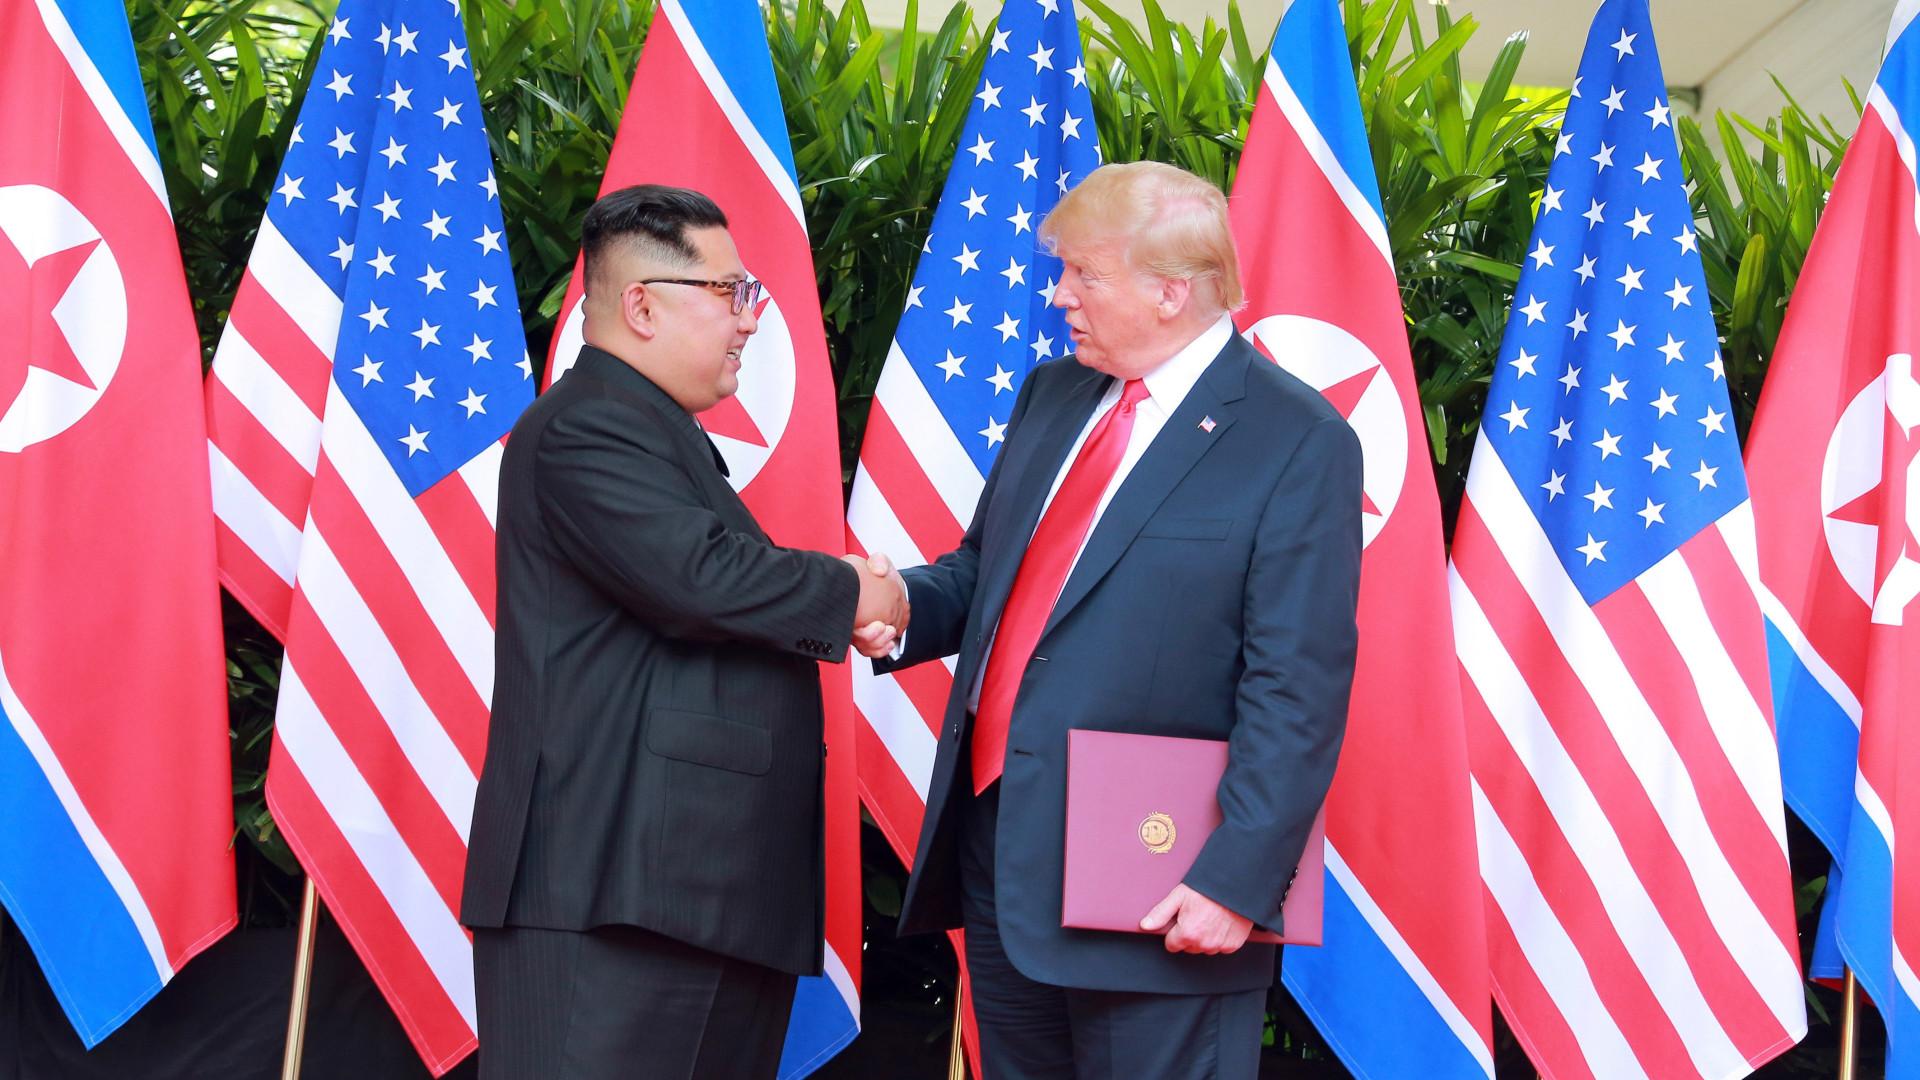 Trump e Kim convidaram-se para visitar respectivos países